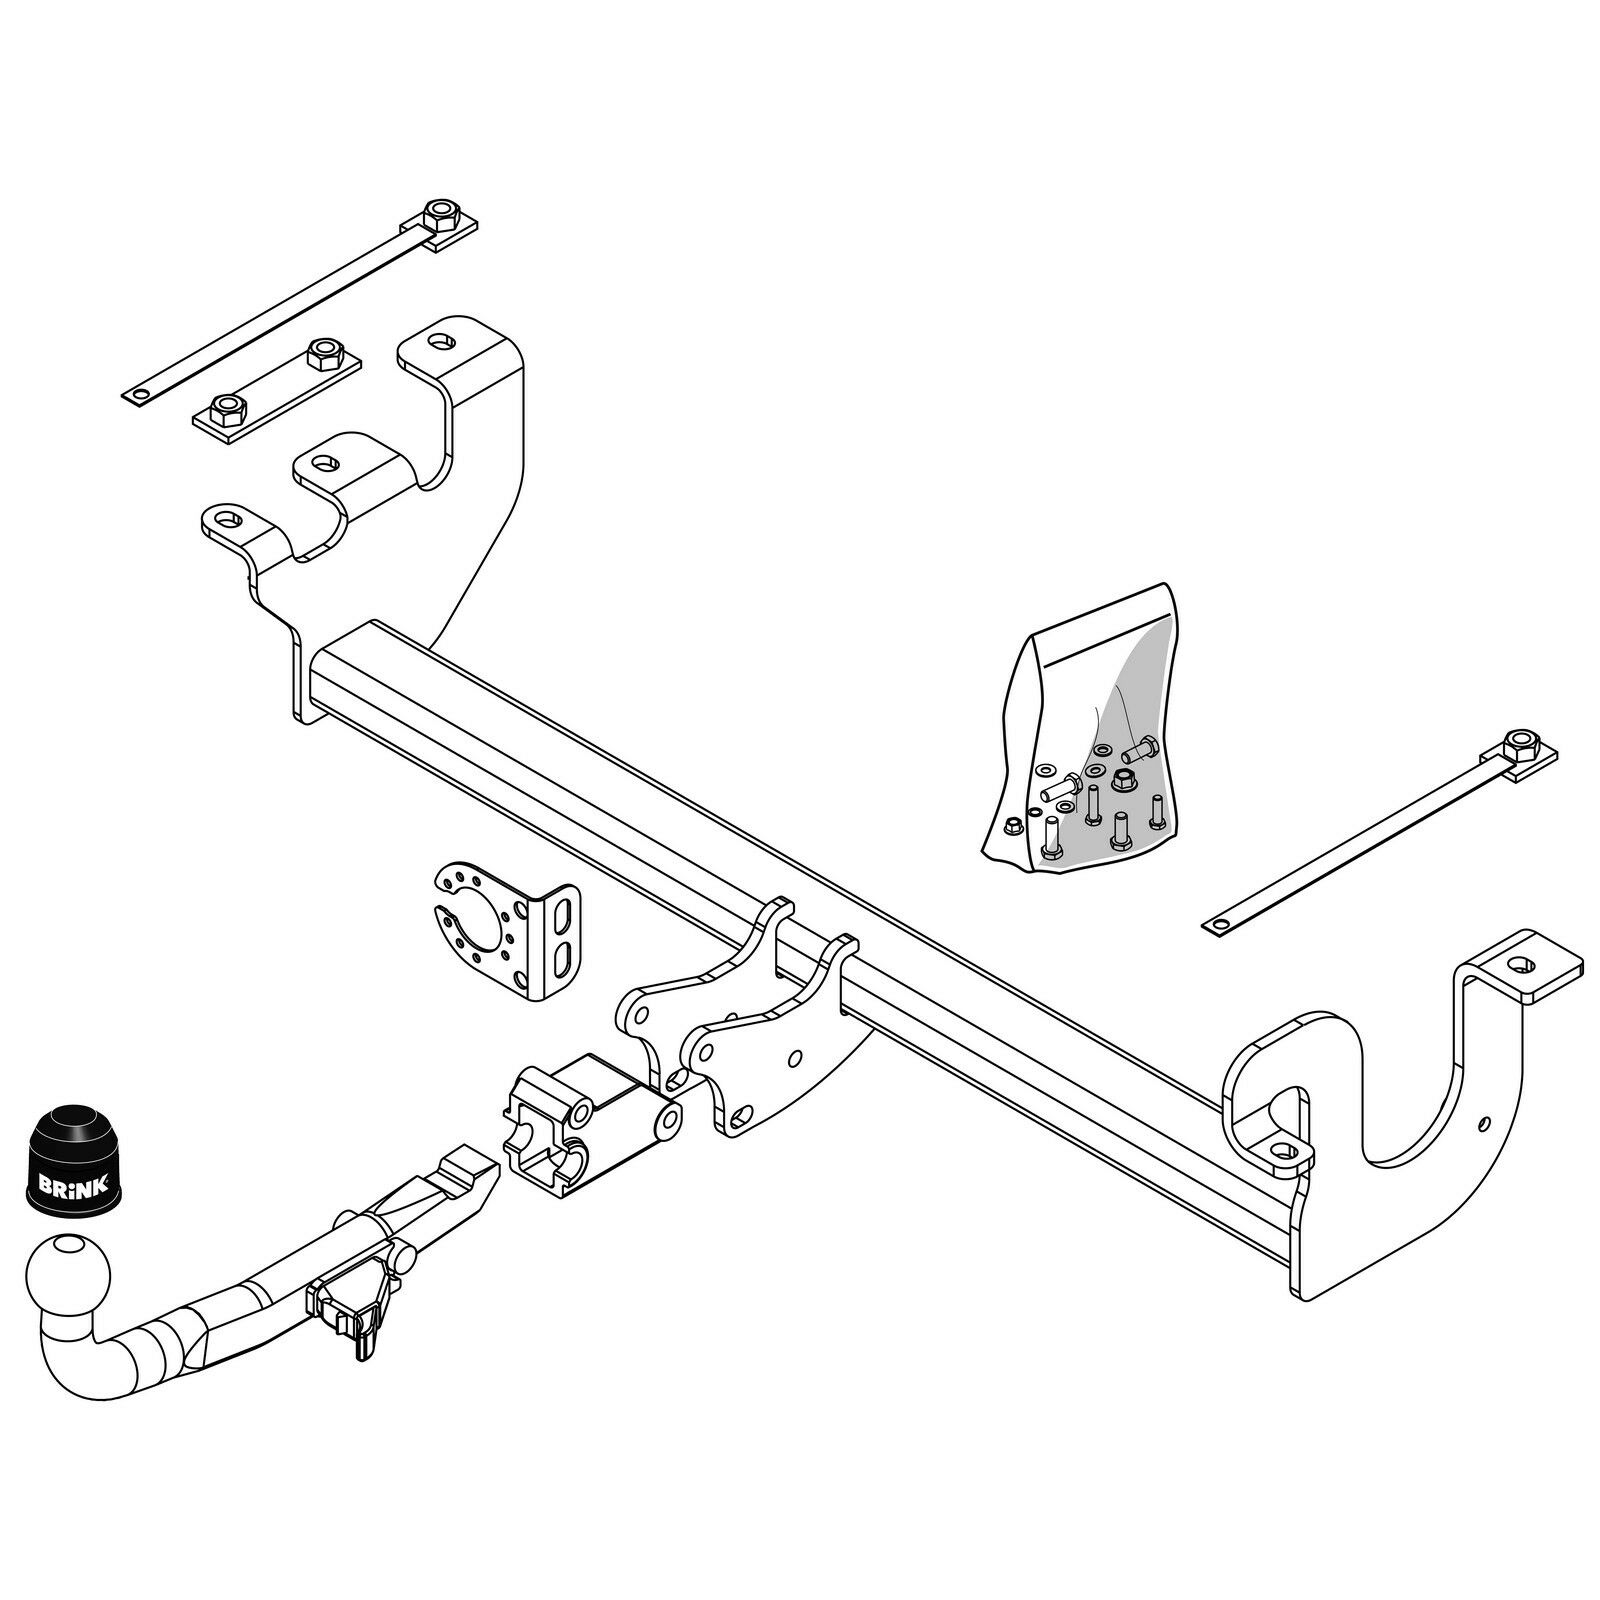 Brink Towbar For Suzuki Jimny 1998 2018 Detachable Tow Bar Ebay